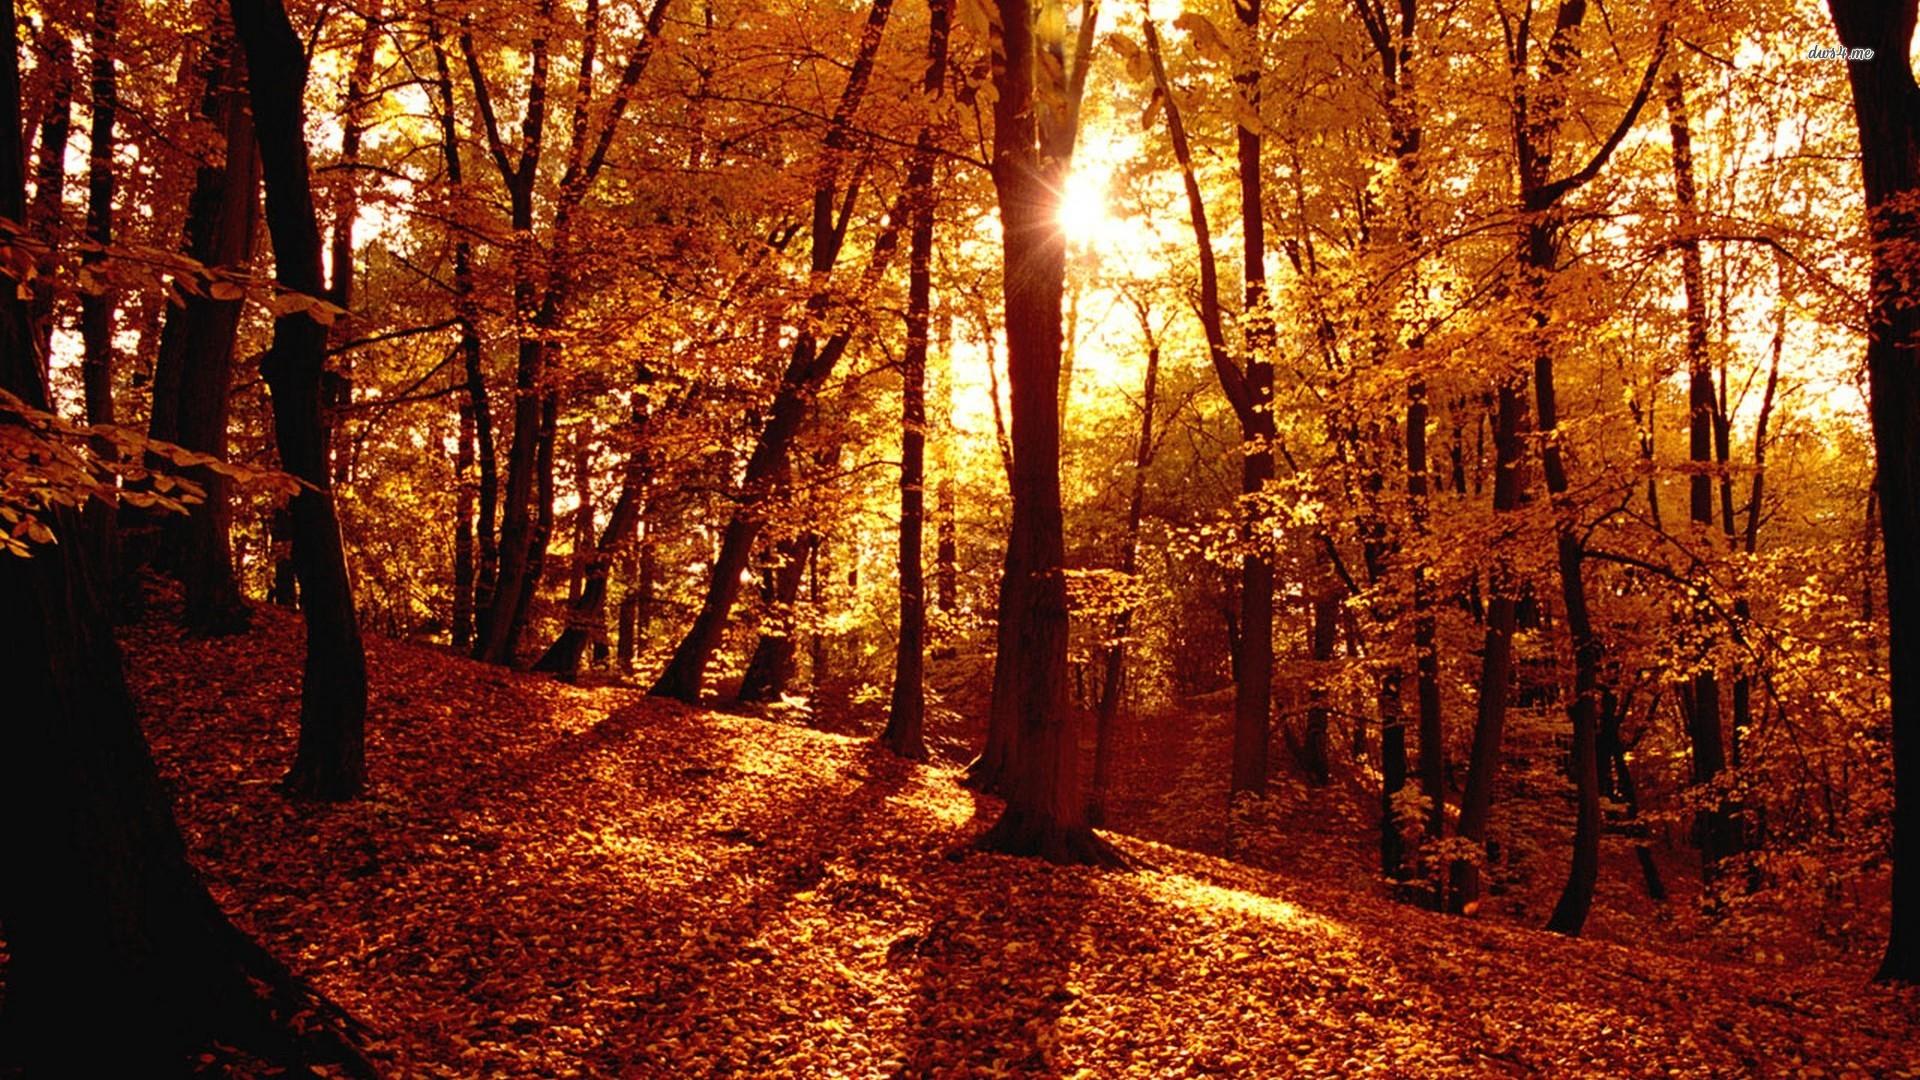 100% HDQ Autumn Forest Wallpapers | Desktop 4K HD Backgrounds